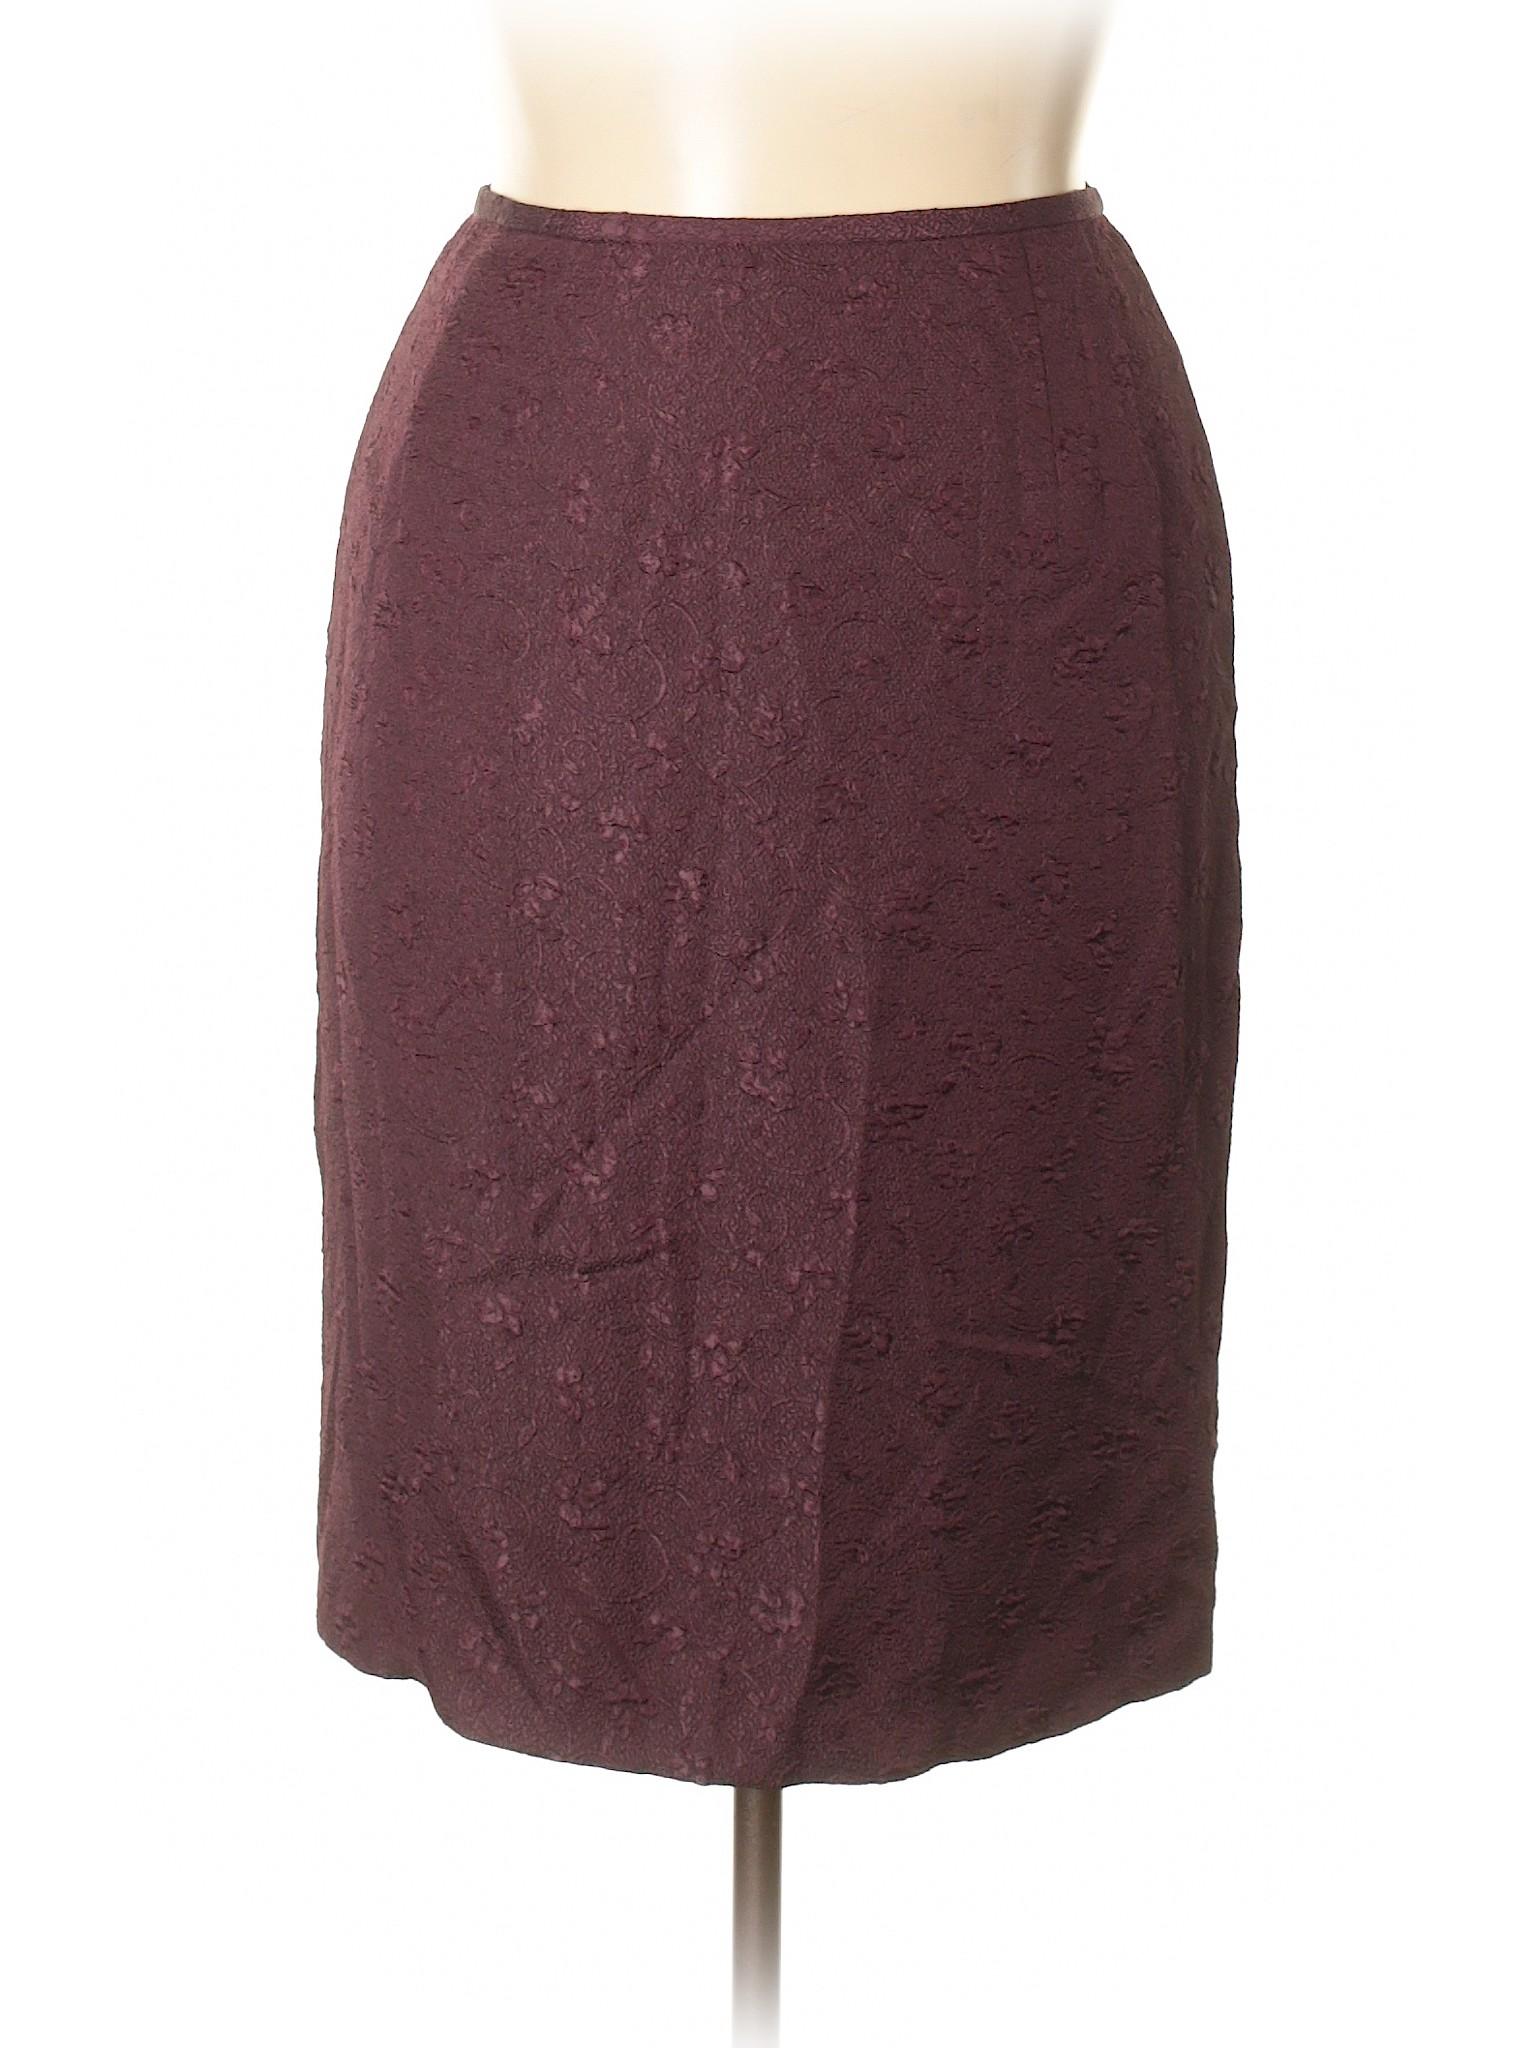 Skirt Boutique Casual London leisure Maggy 0qYvZ4